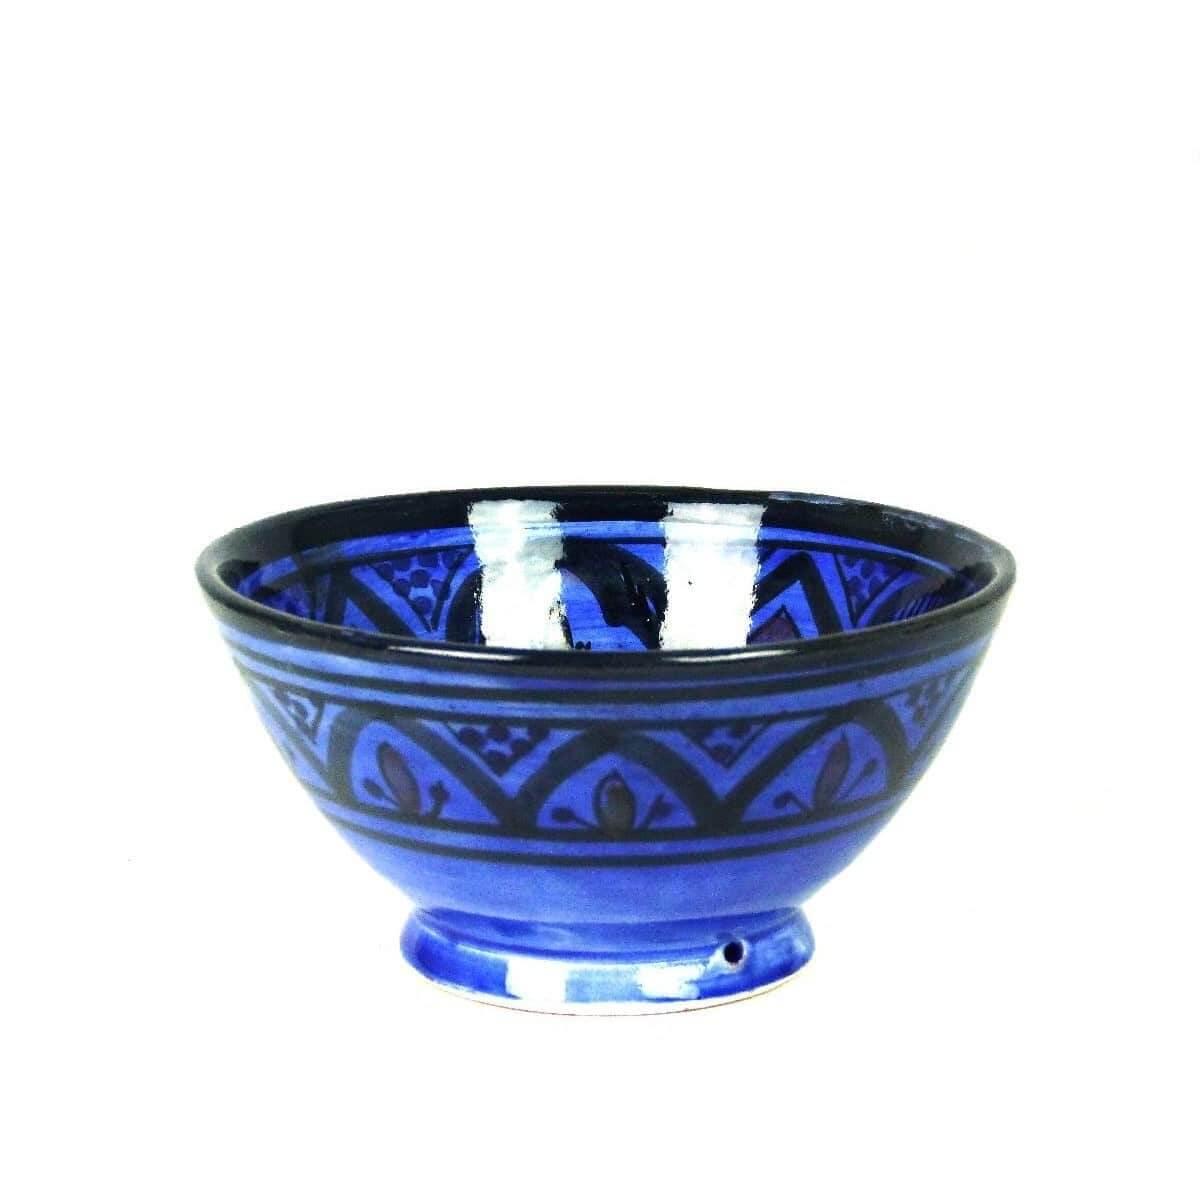 Orientalische marokkanische Keramikschale Keramik Obst Salat Reis kl